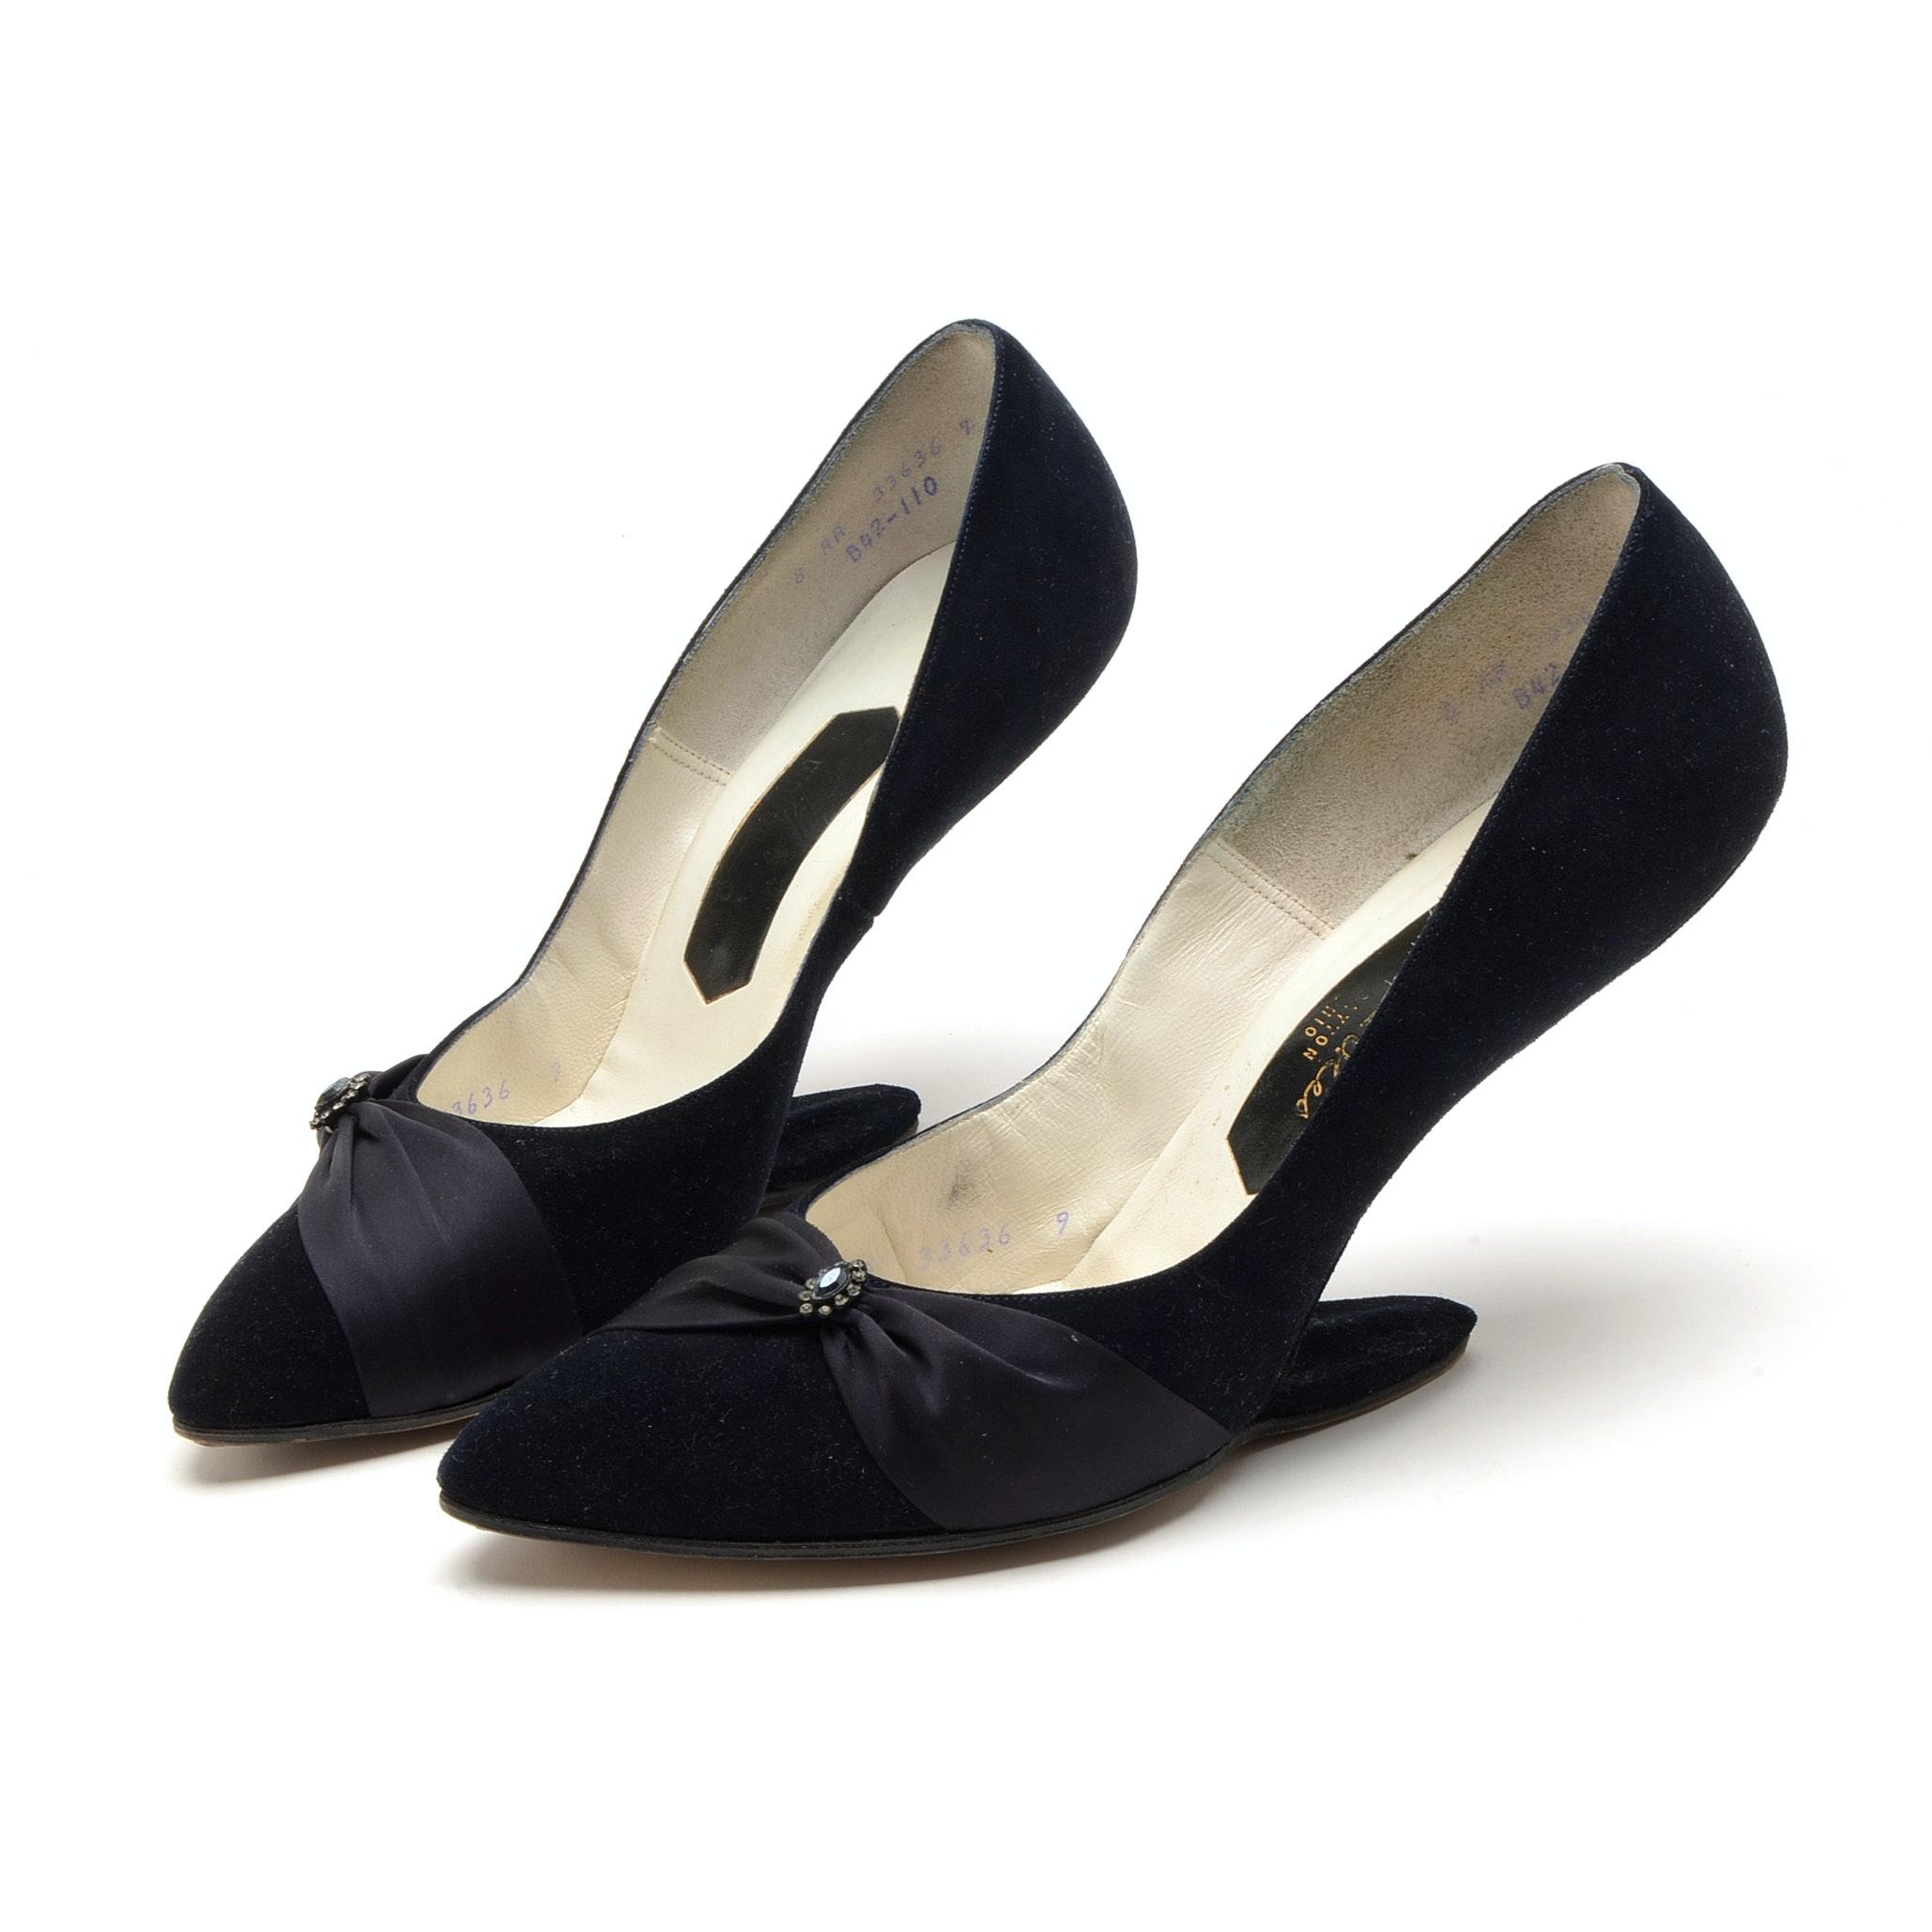 Vintage Paramount by Kalmon Heel-Less Shoes